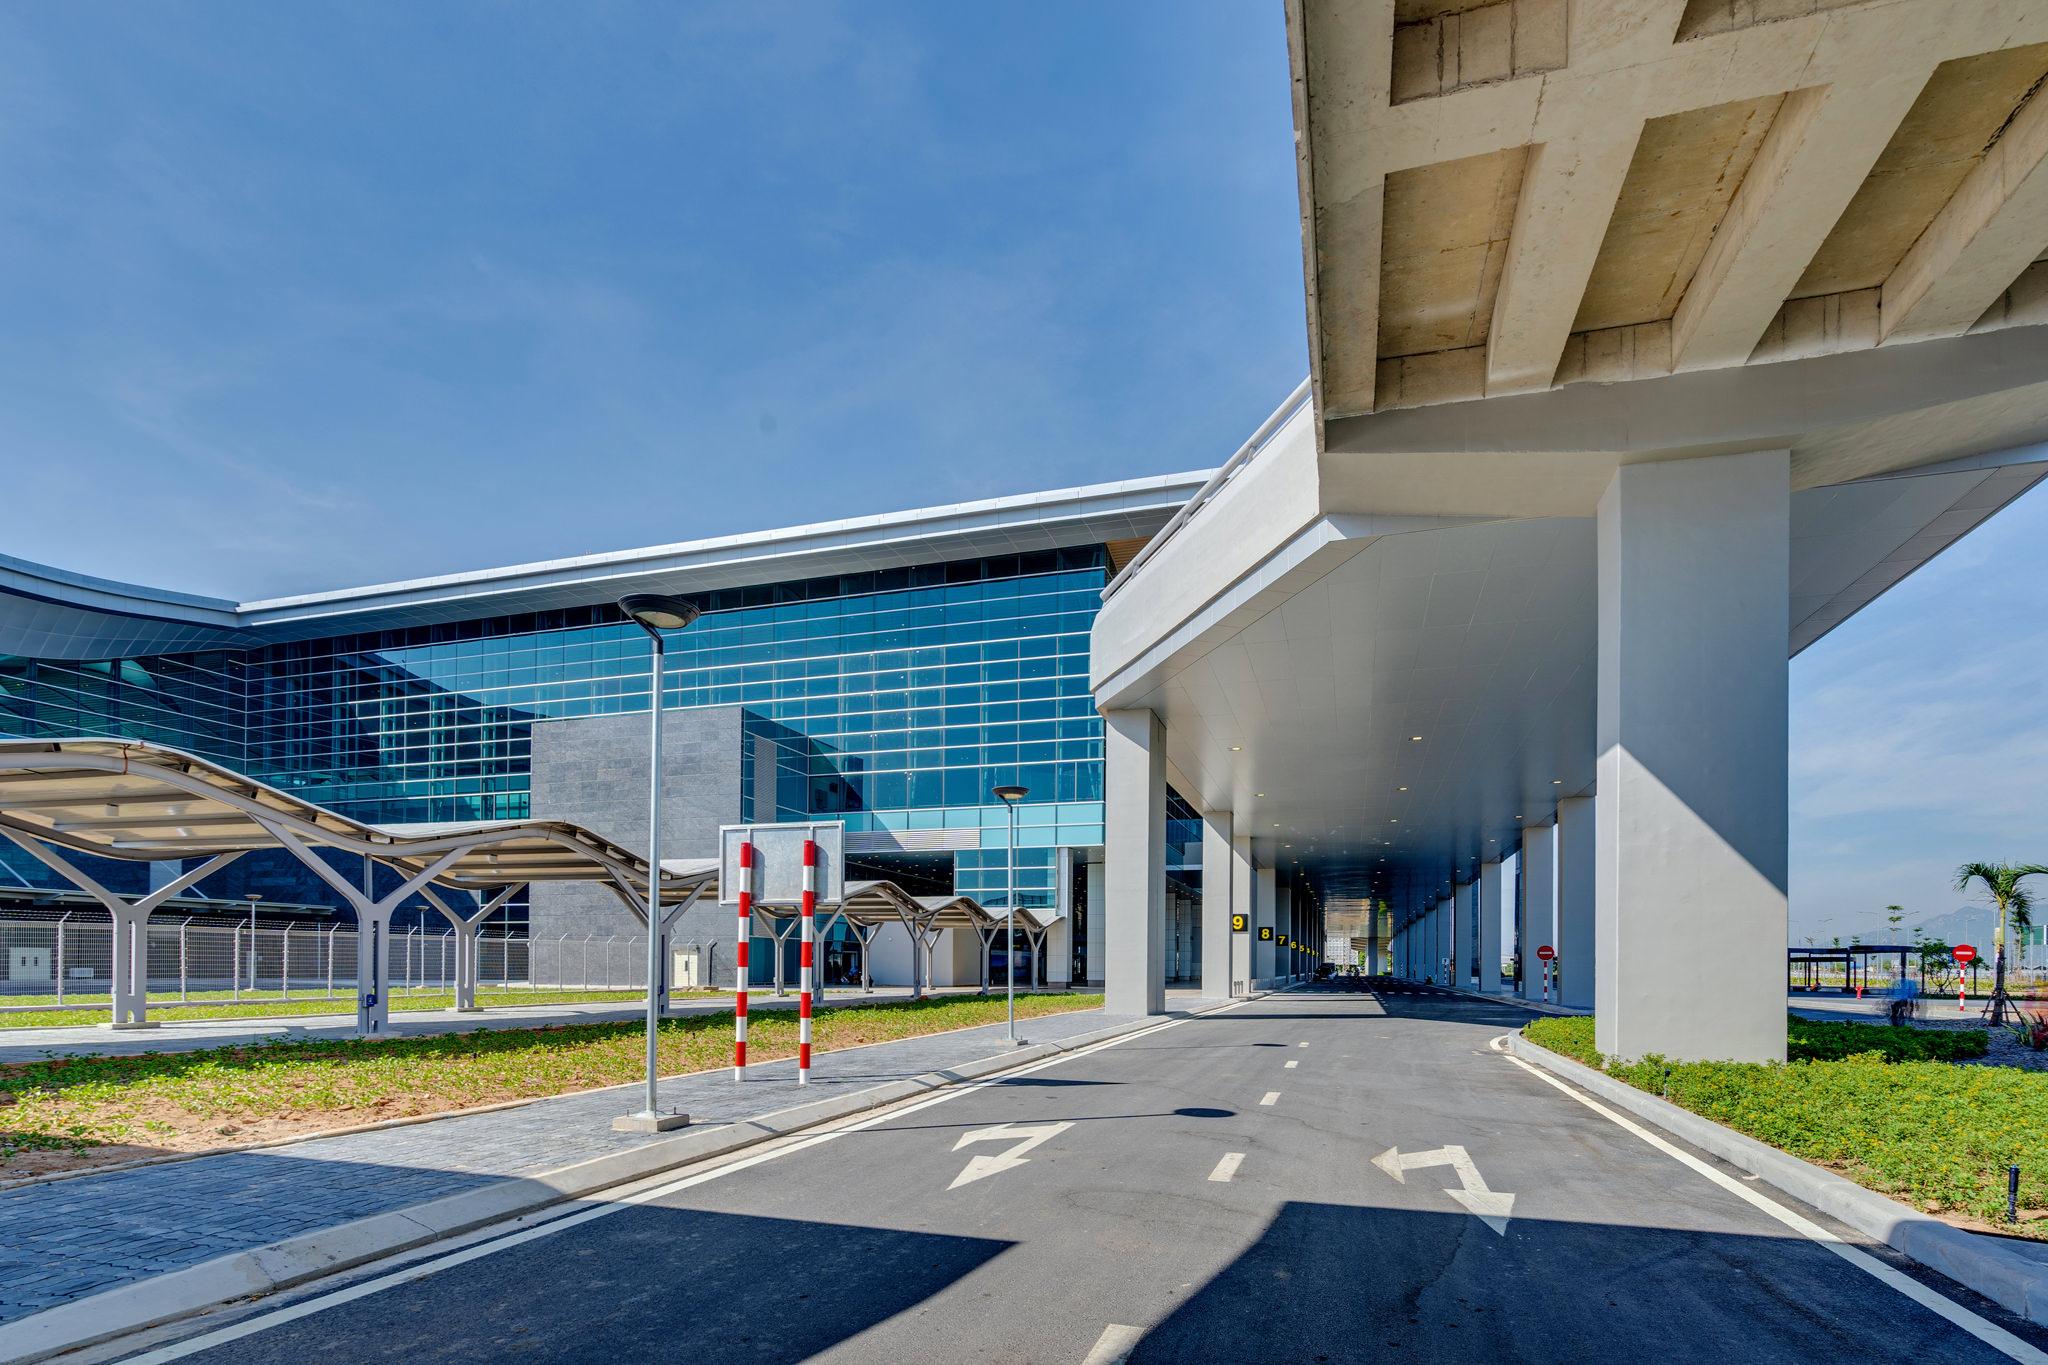 20180626 - Cam Ranh Airport - Architecture - 0233.jpg